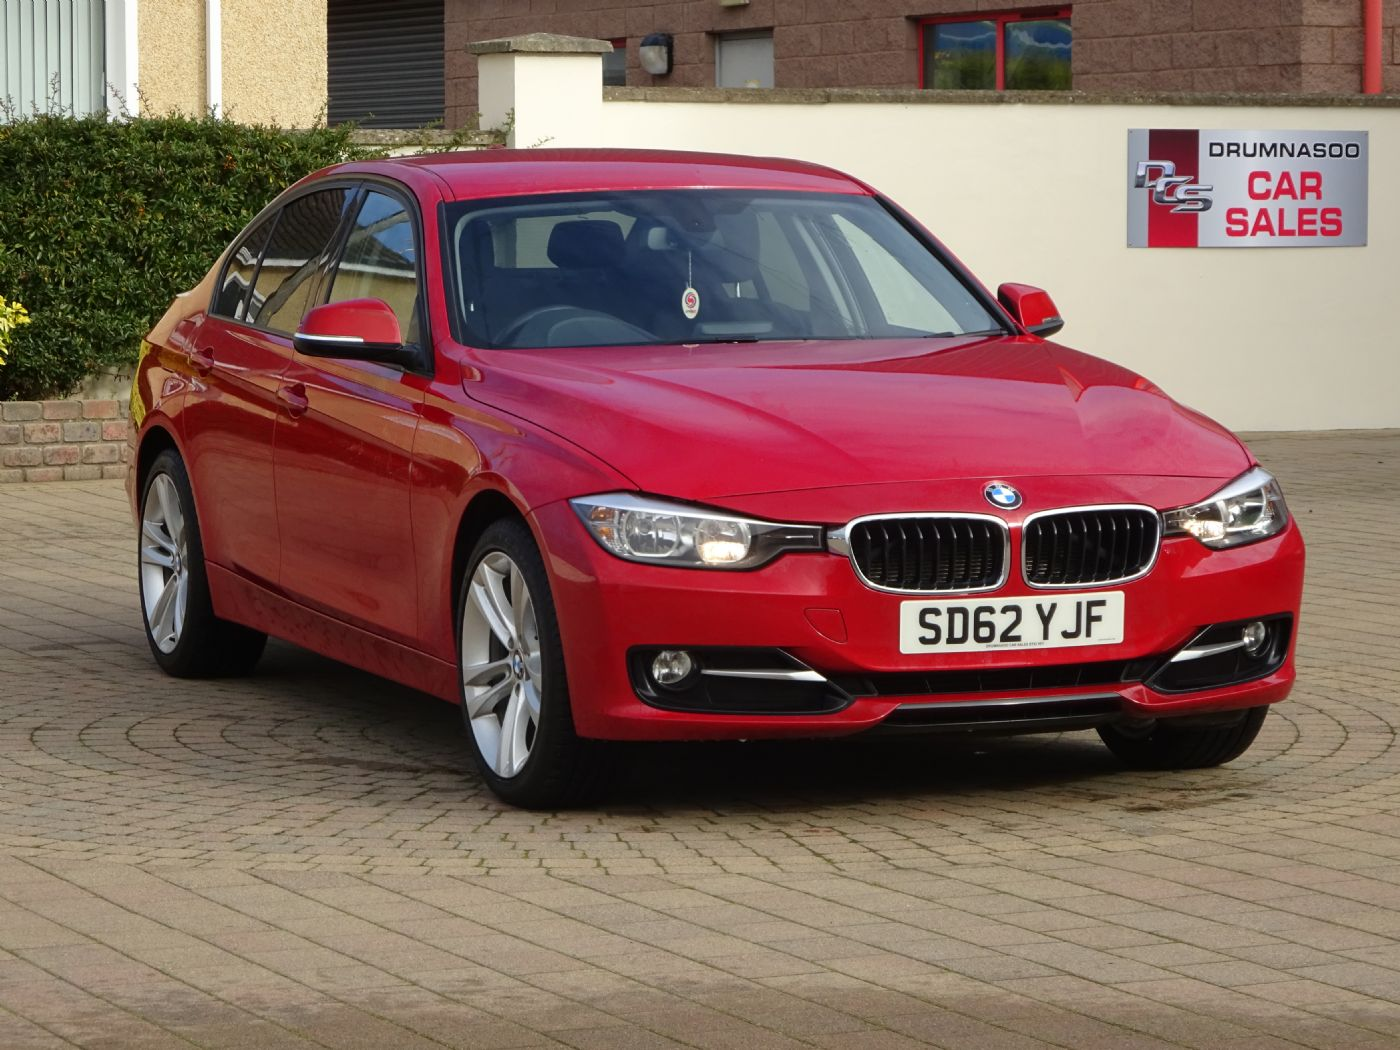 BMW 320D [184] Sport, Cruise control, Sports seats, £30 Road Tax